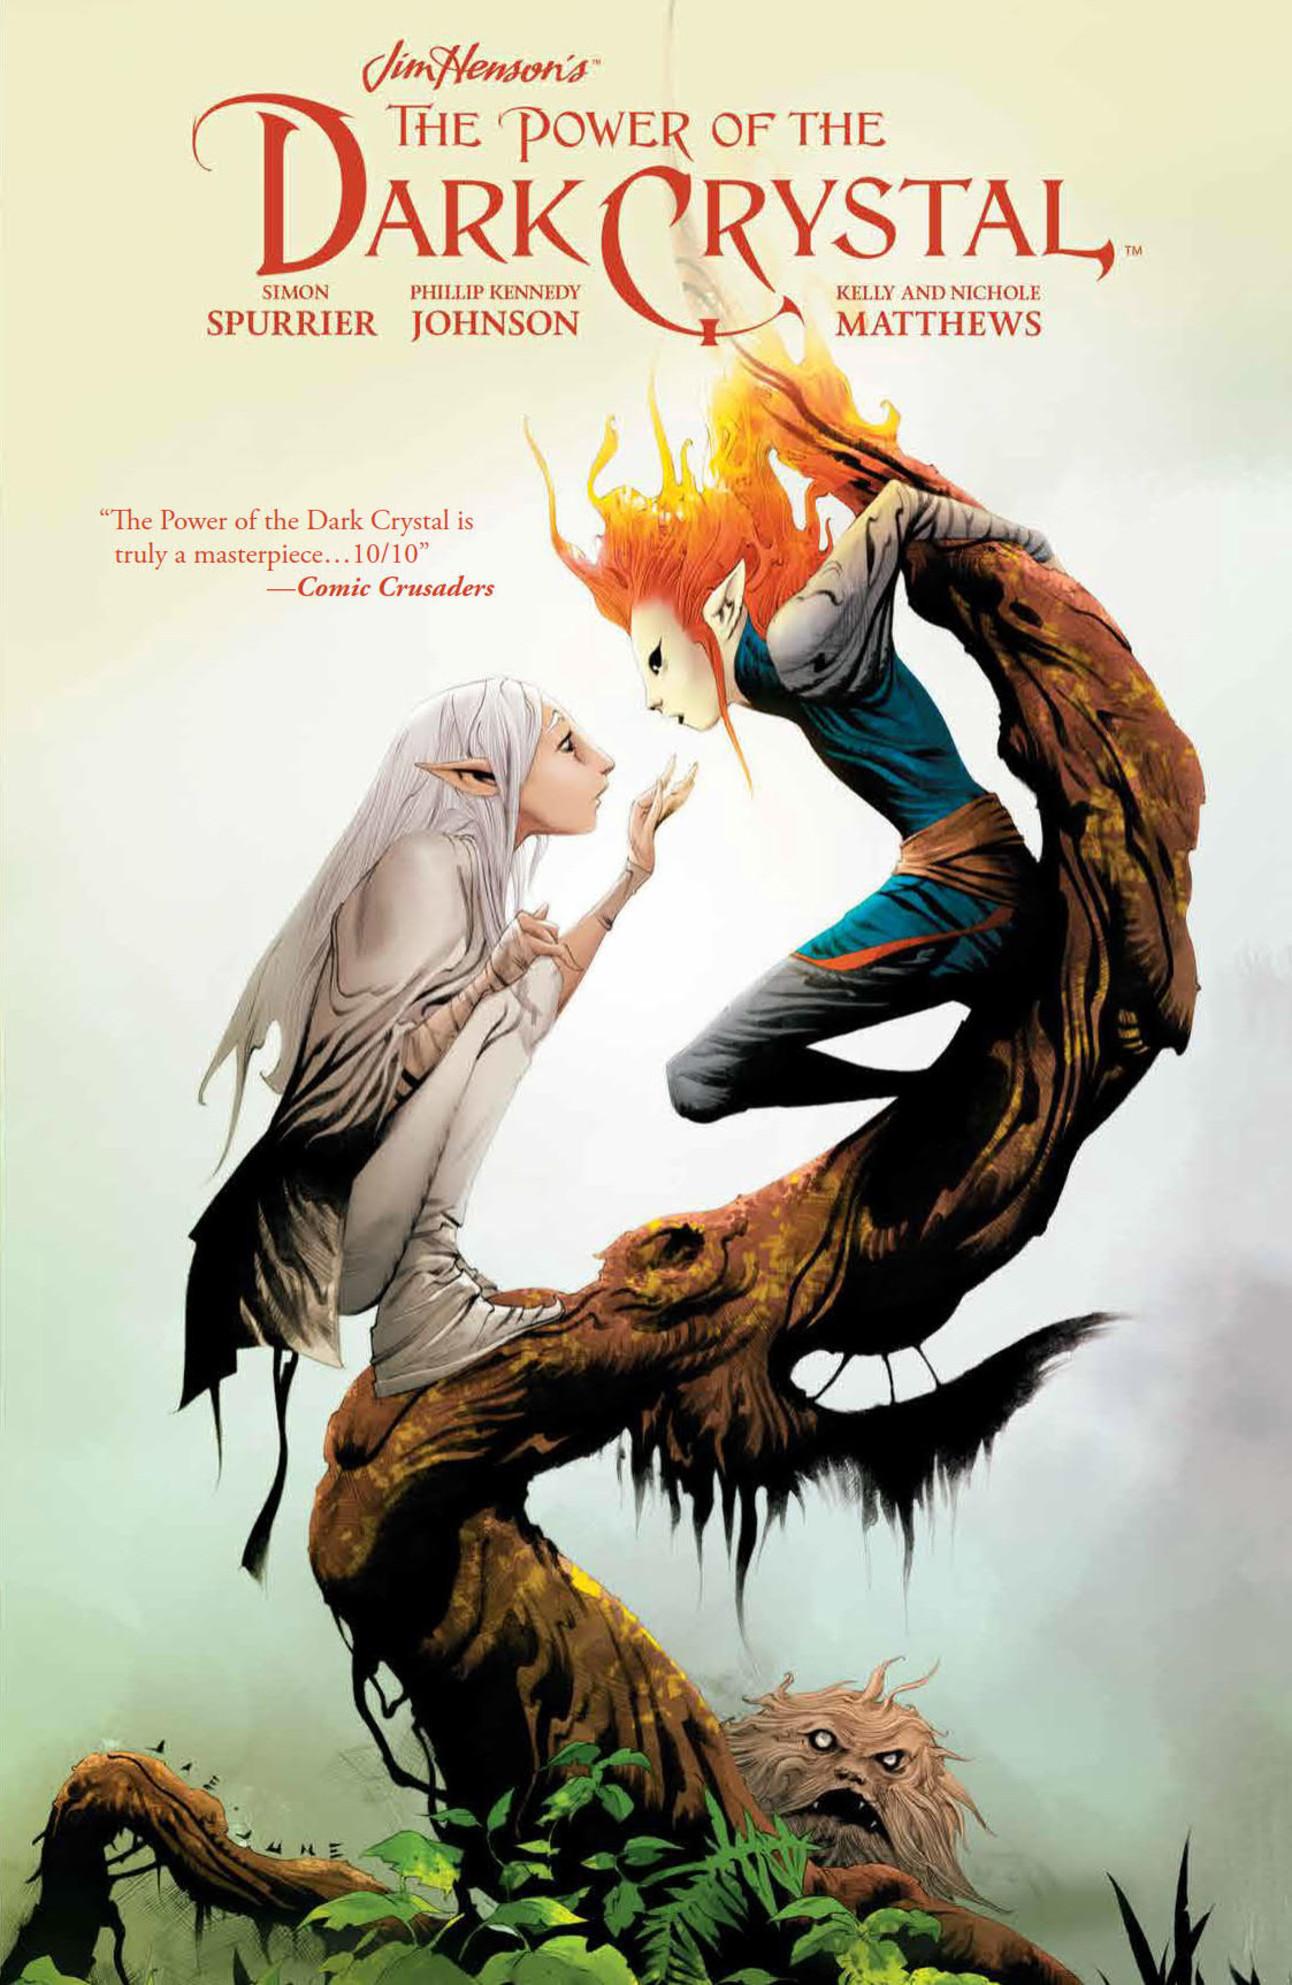 Power of the Dark Crystal HC Vol. 2 Cover by Jae Lee